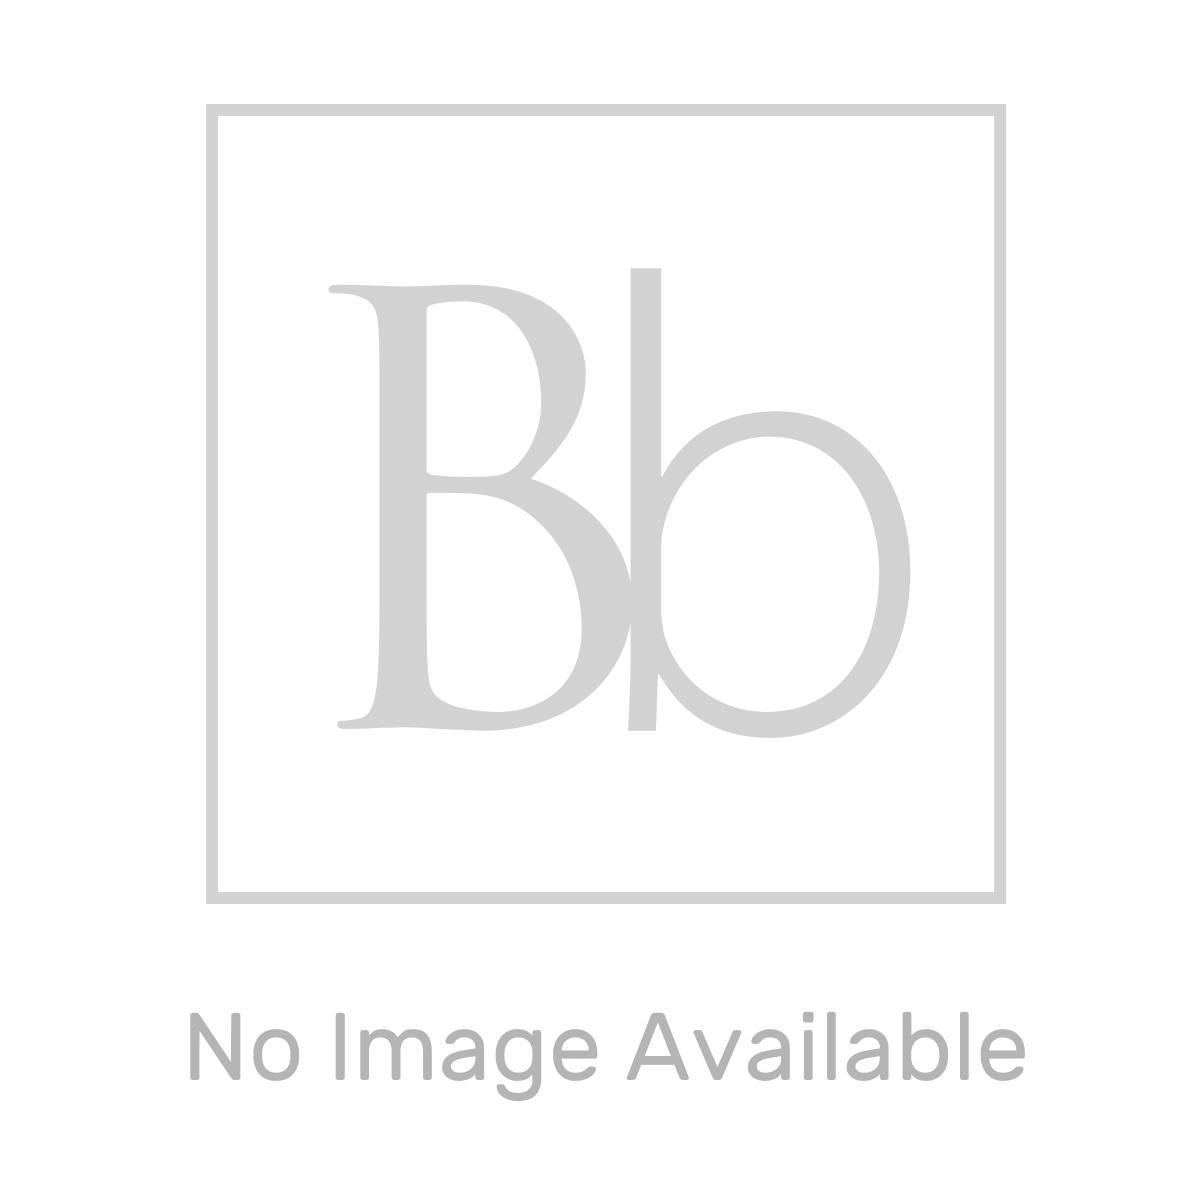 Cassellie Socorro Thermostatic Bath Filler Shower Kit Inset